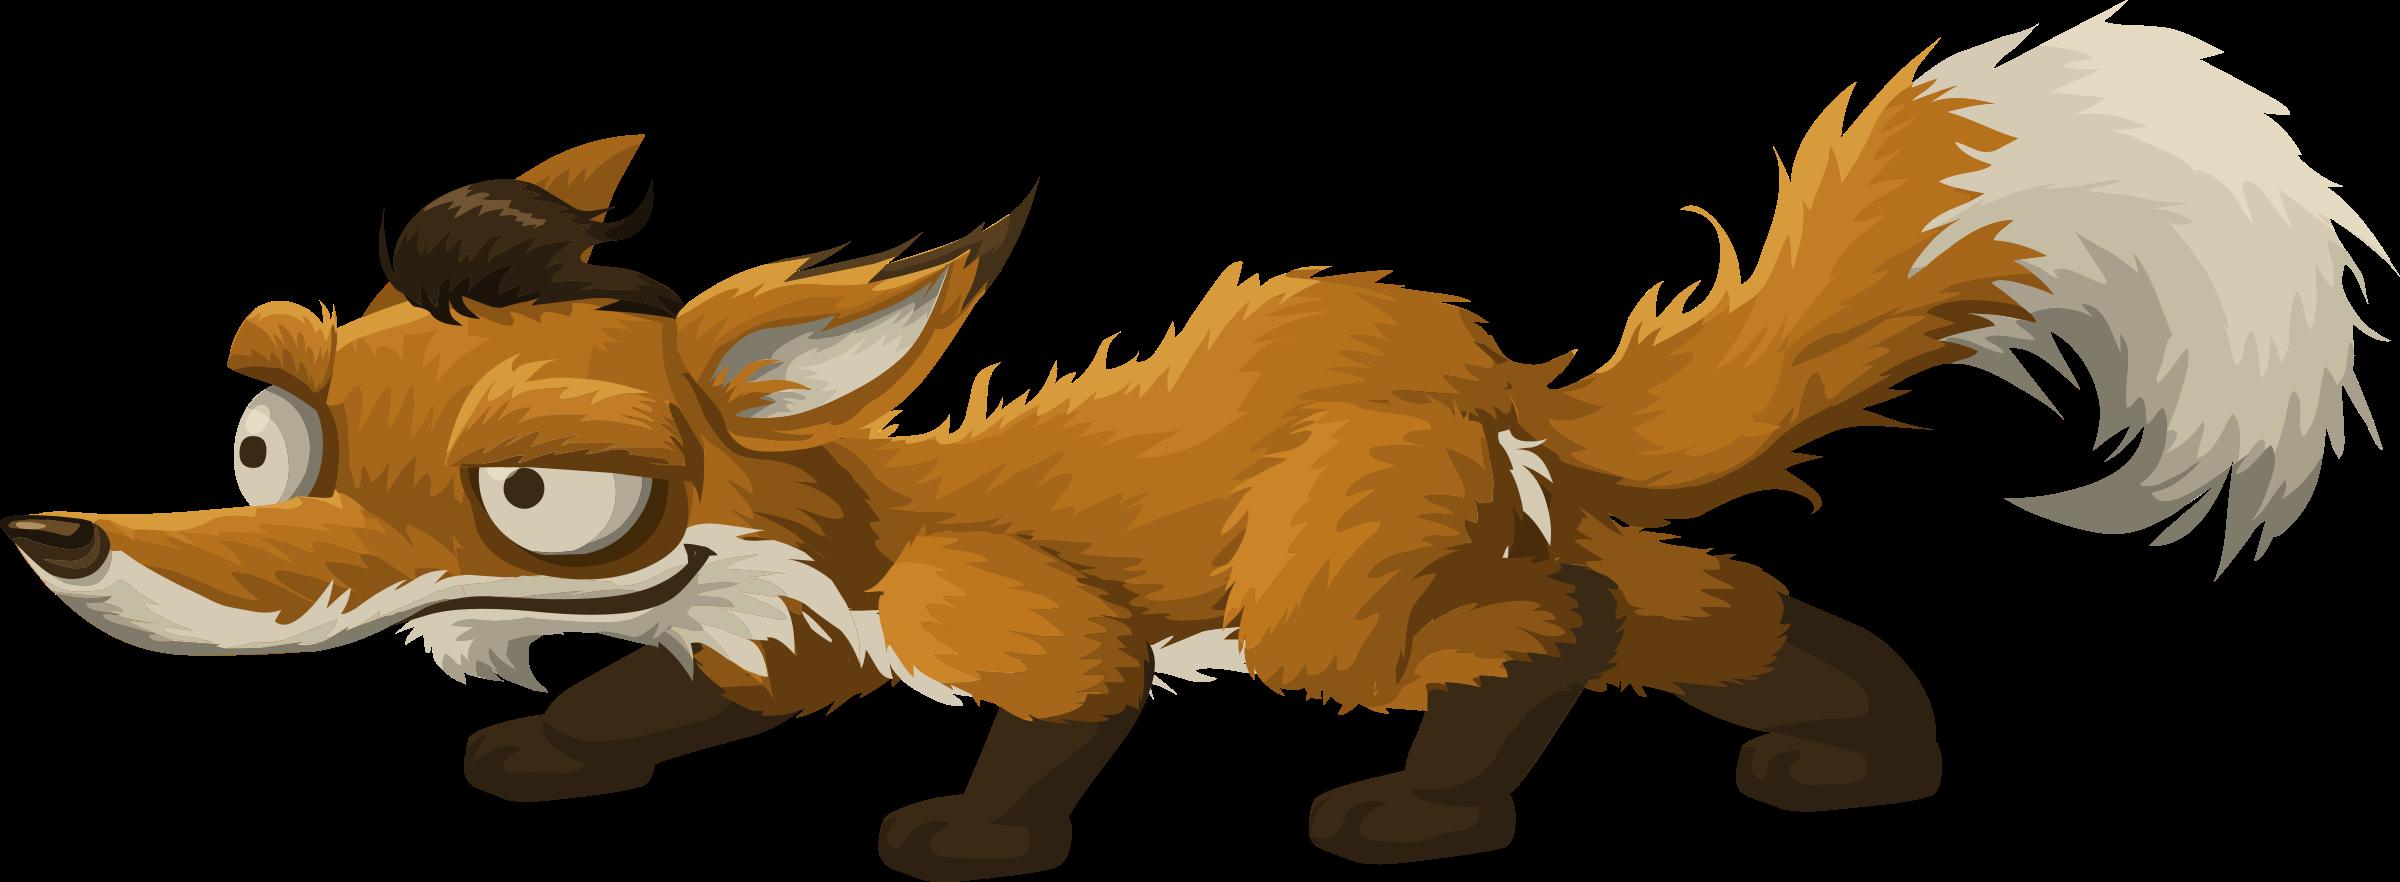 Fox clipart bat eared fox. Png